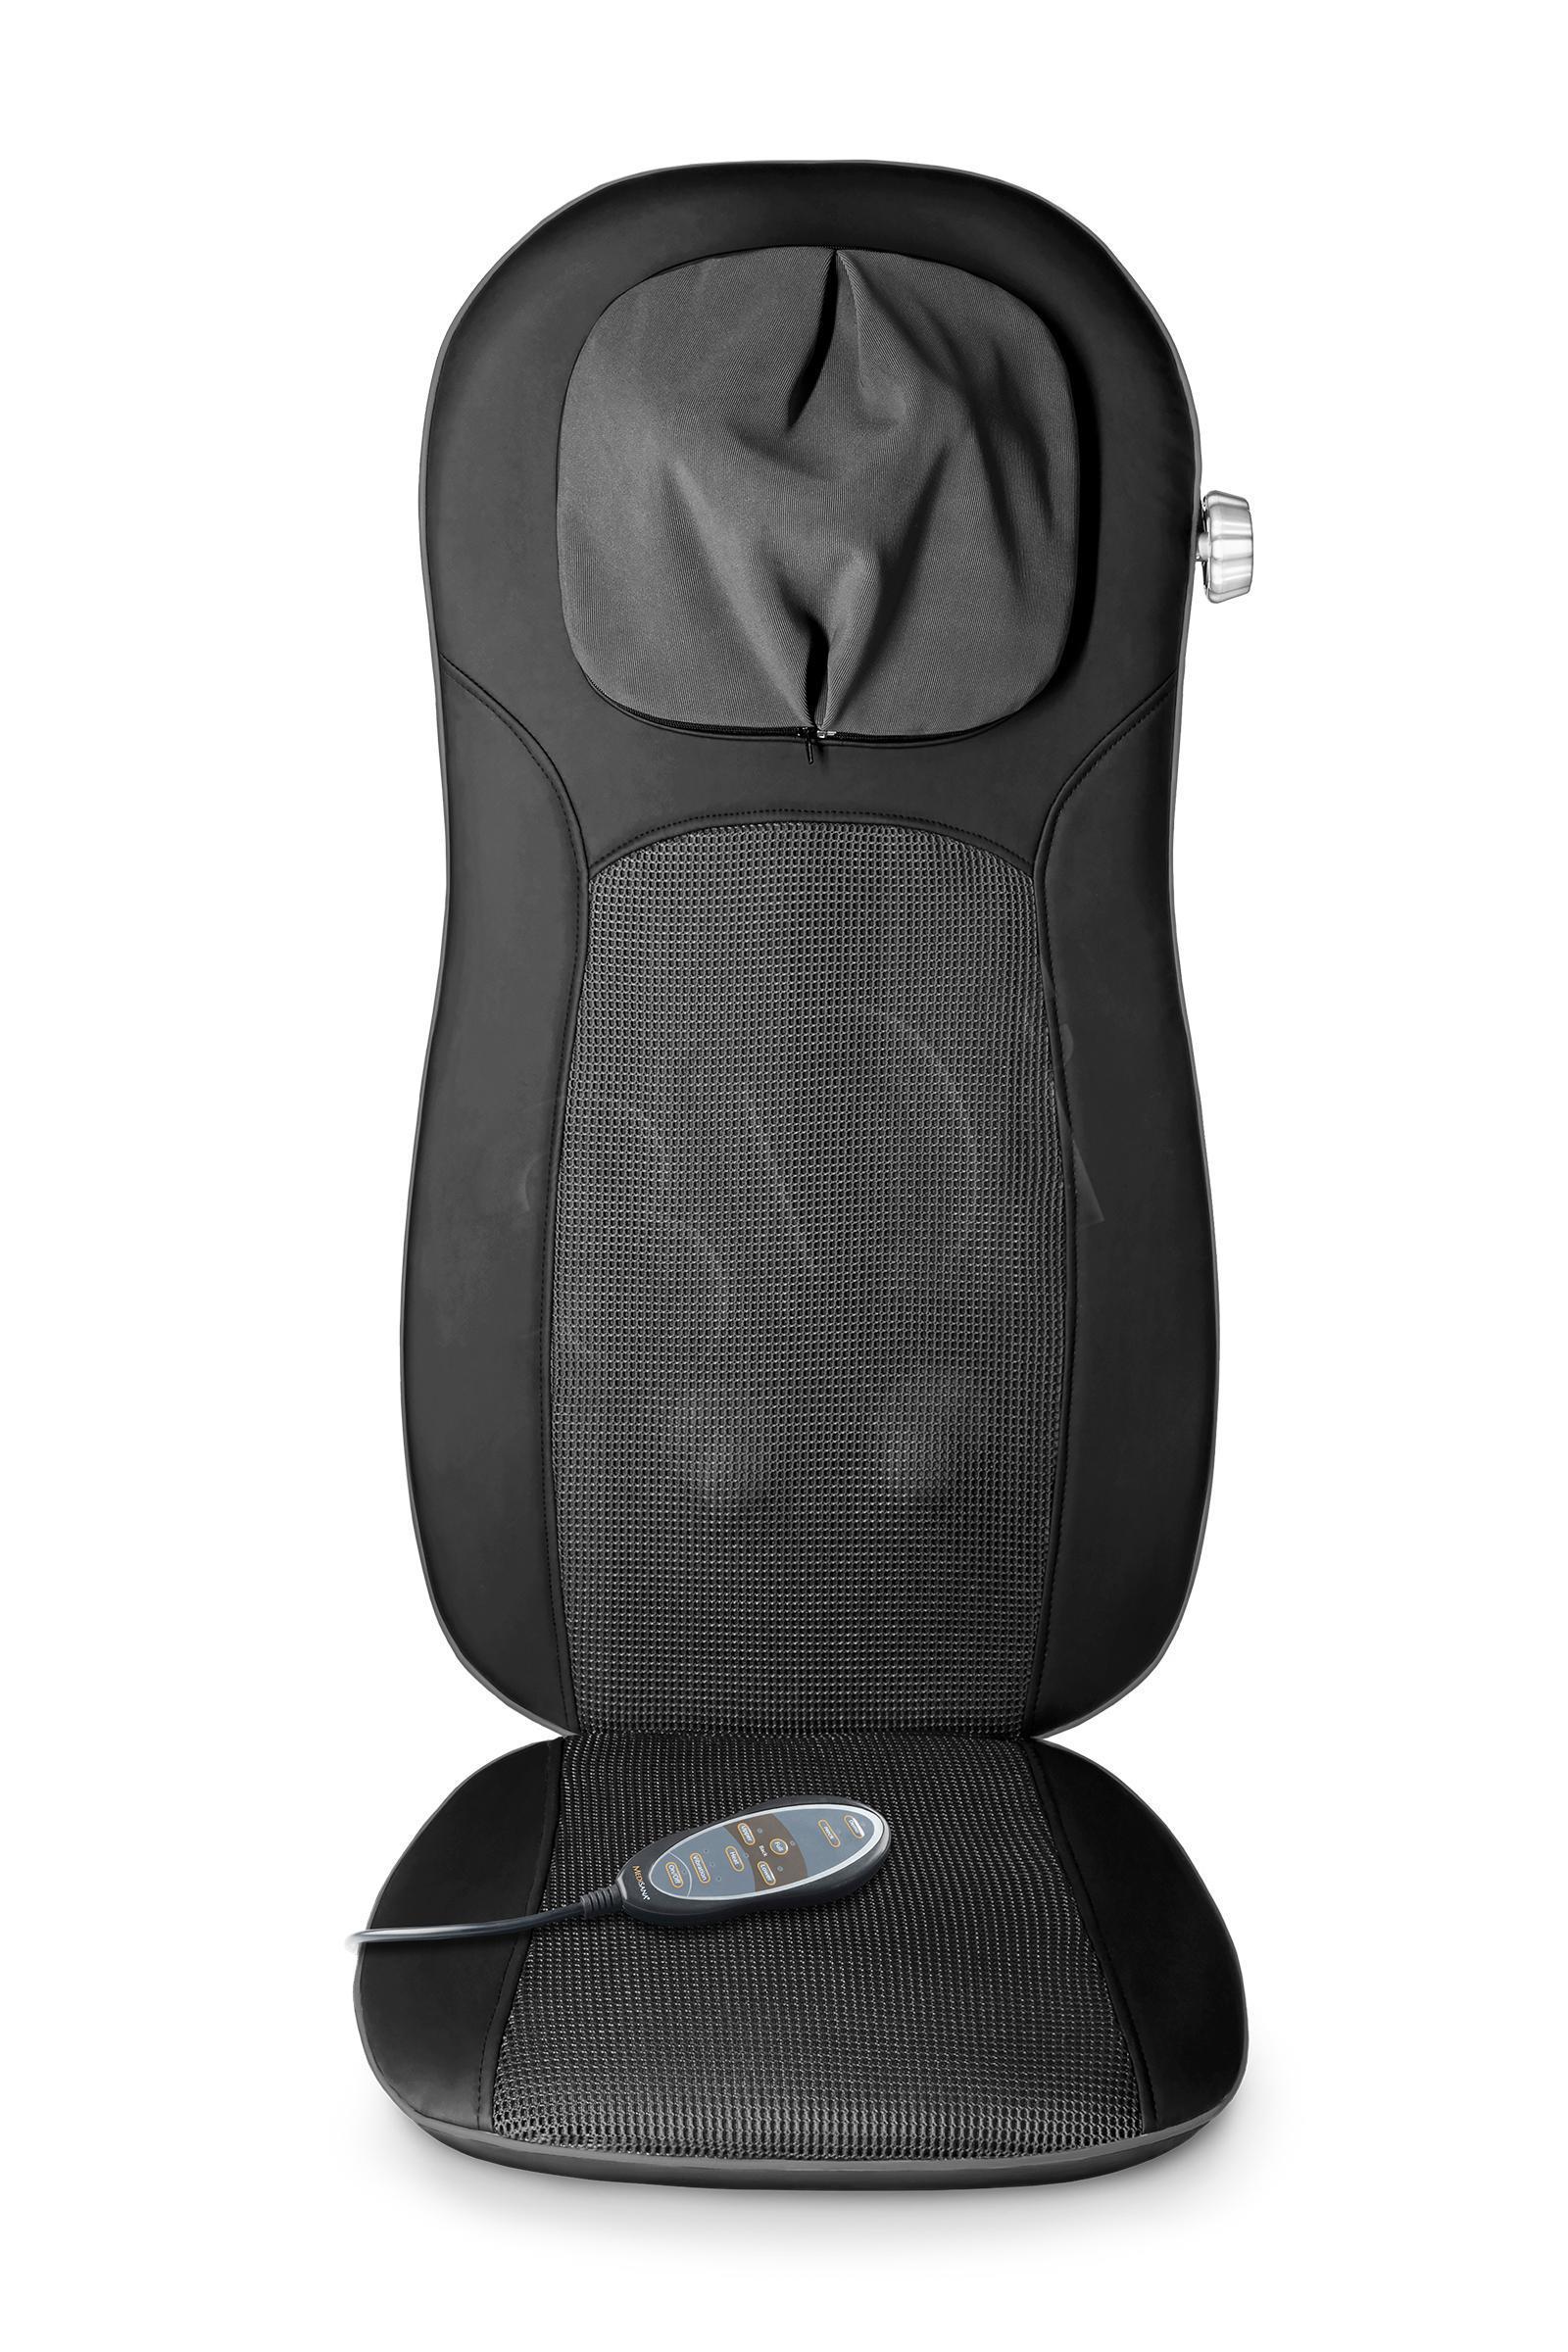 Medisana Medisana MCN Pro Shiatsu massage seat pad masāžas ierīce